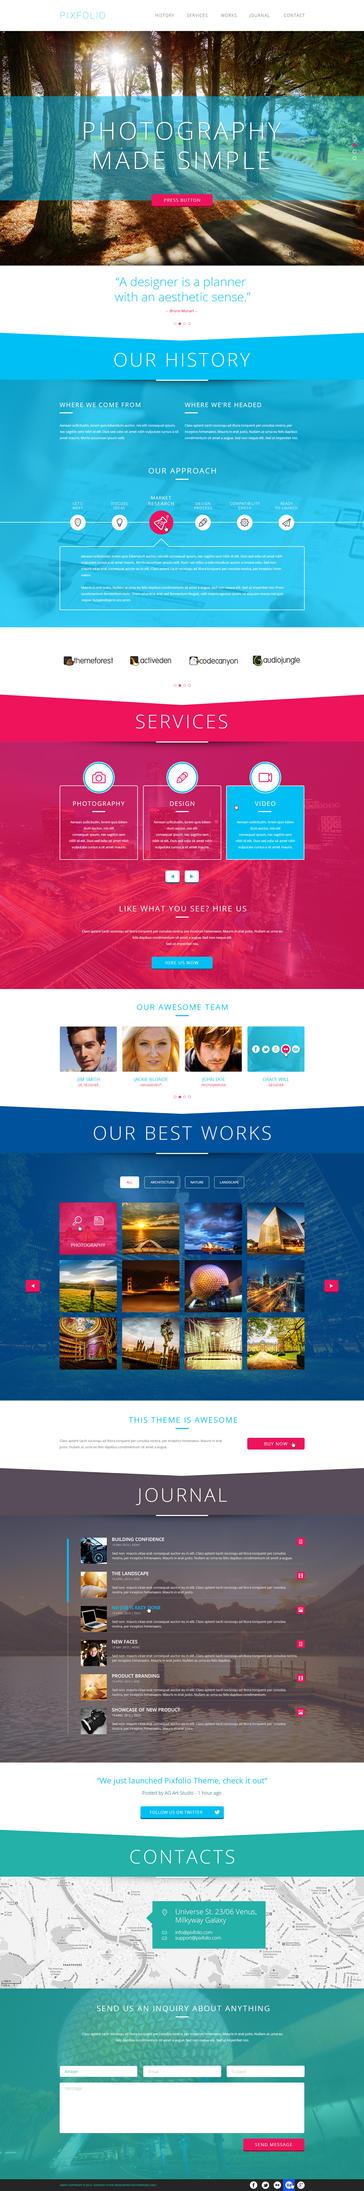 Pixfolio - Creative One Page Portfolio by heavenzART